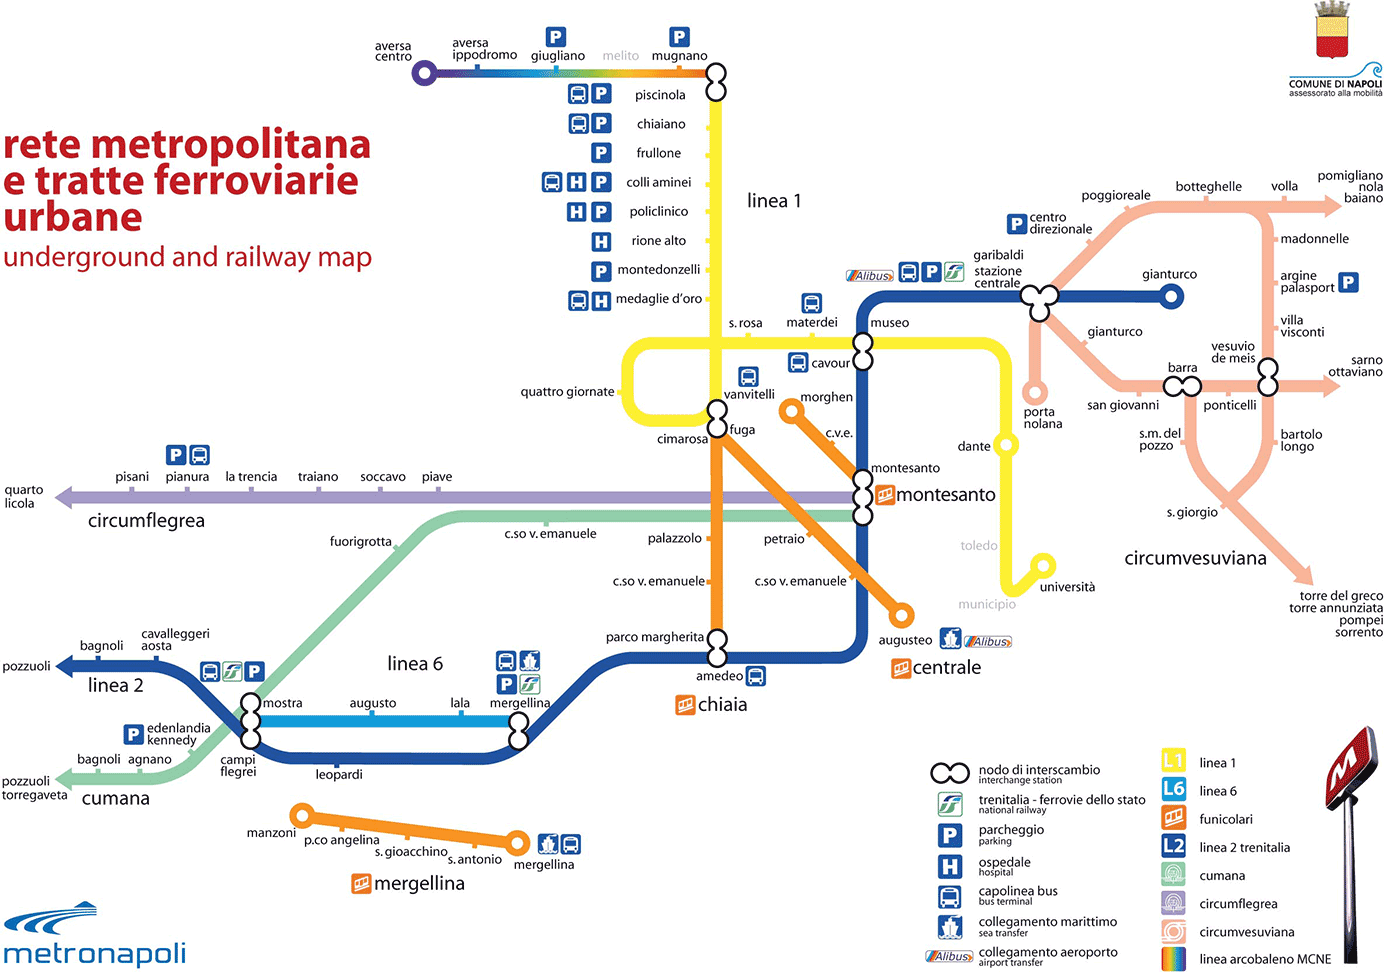 rete metropolitana di napoli